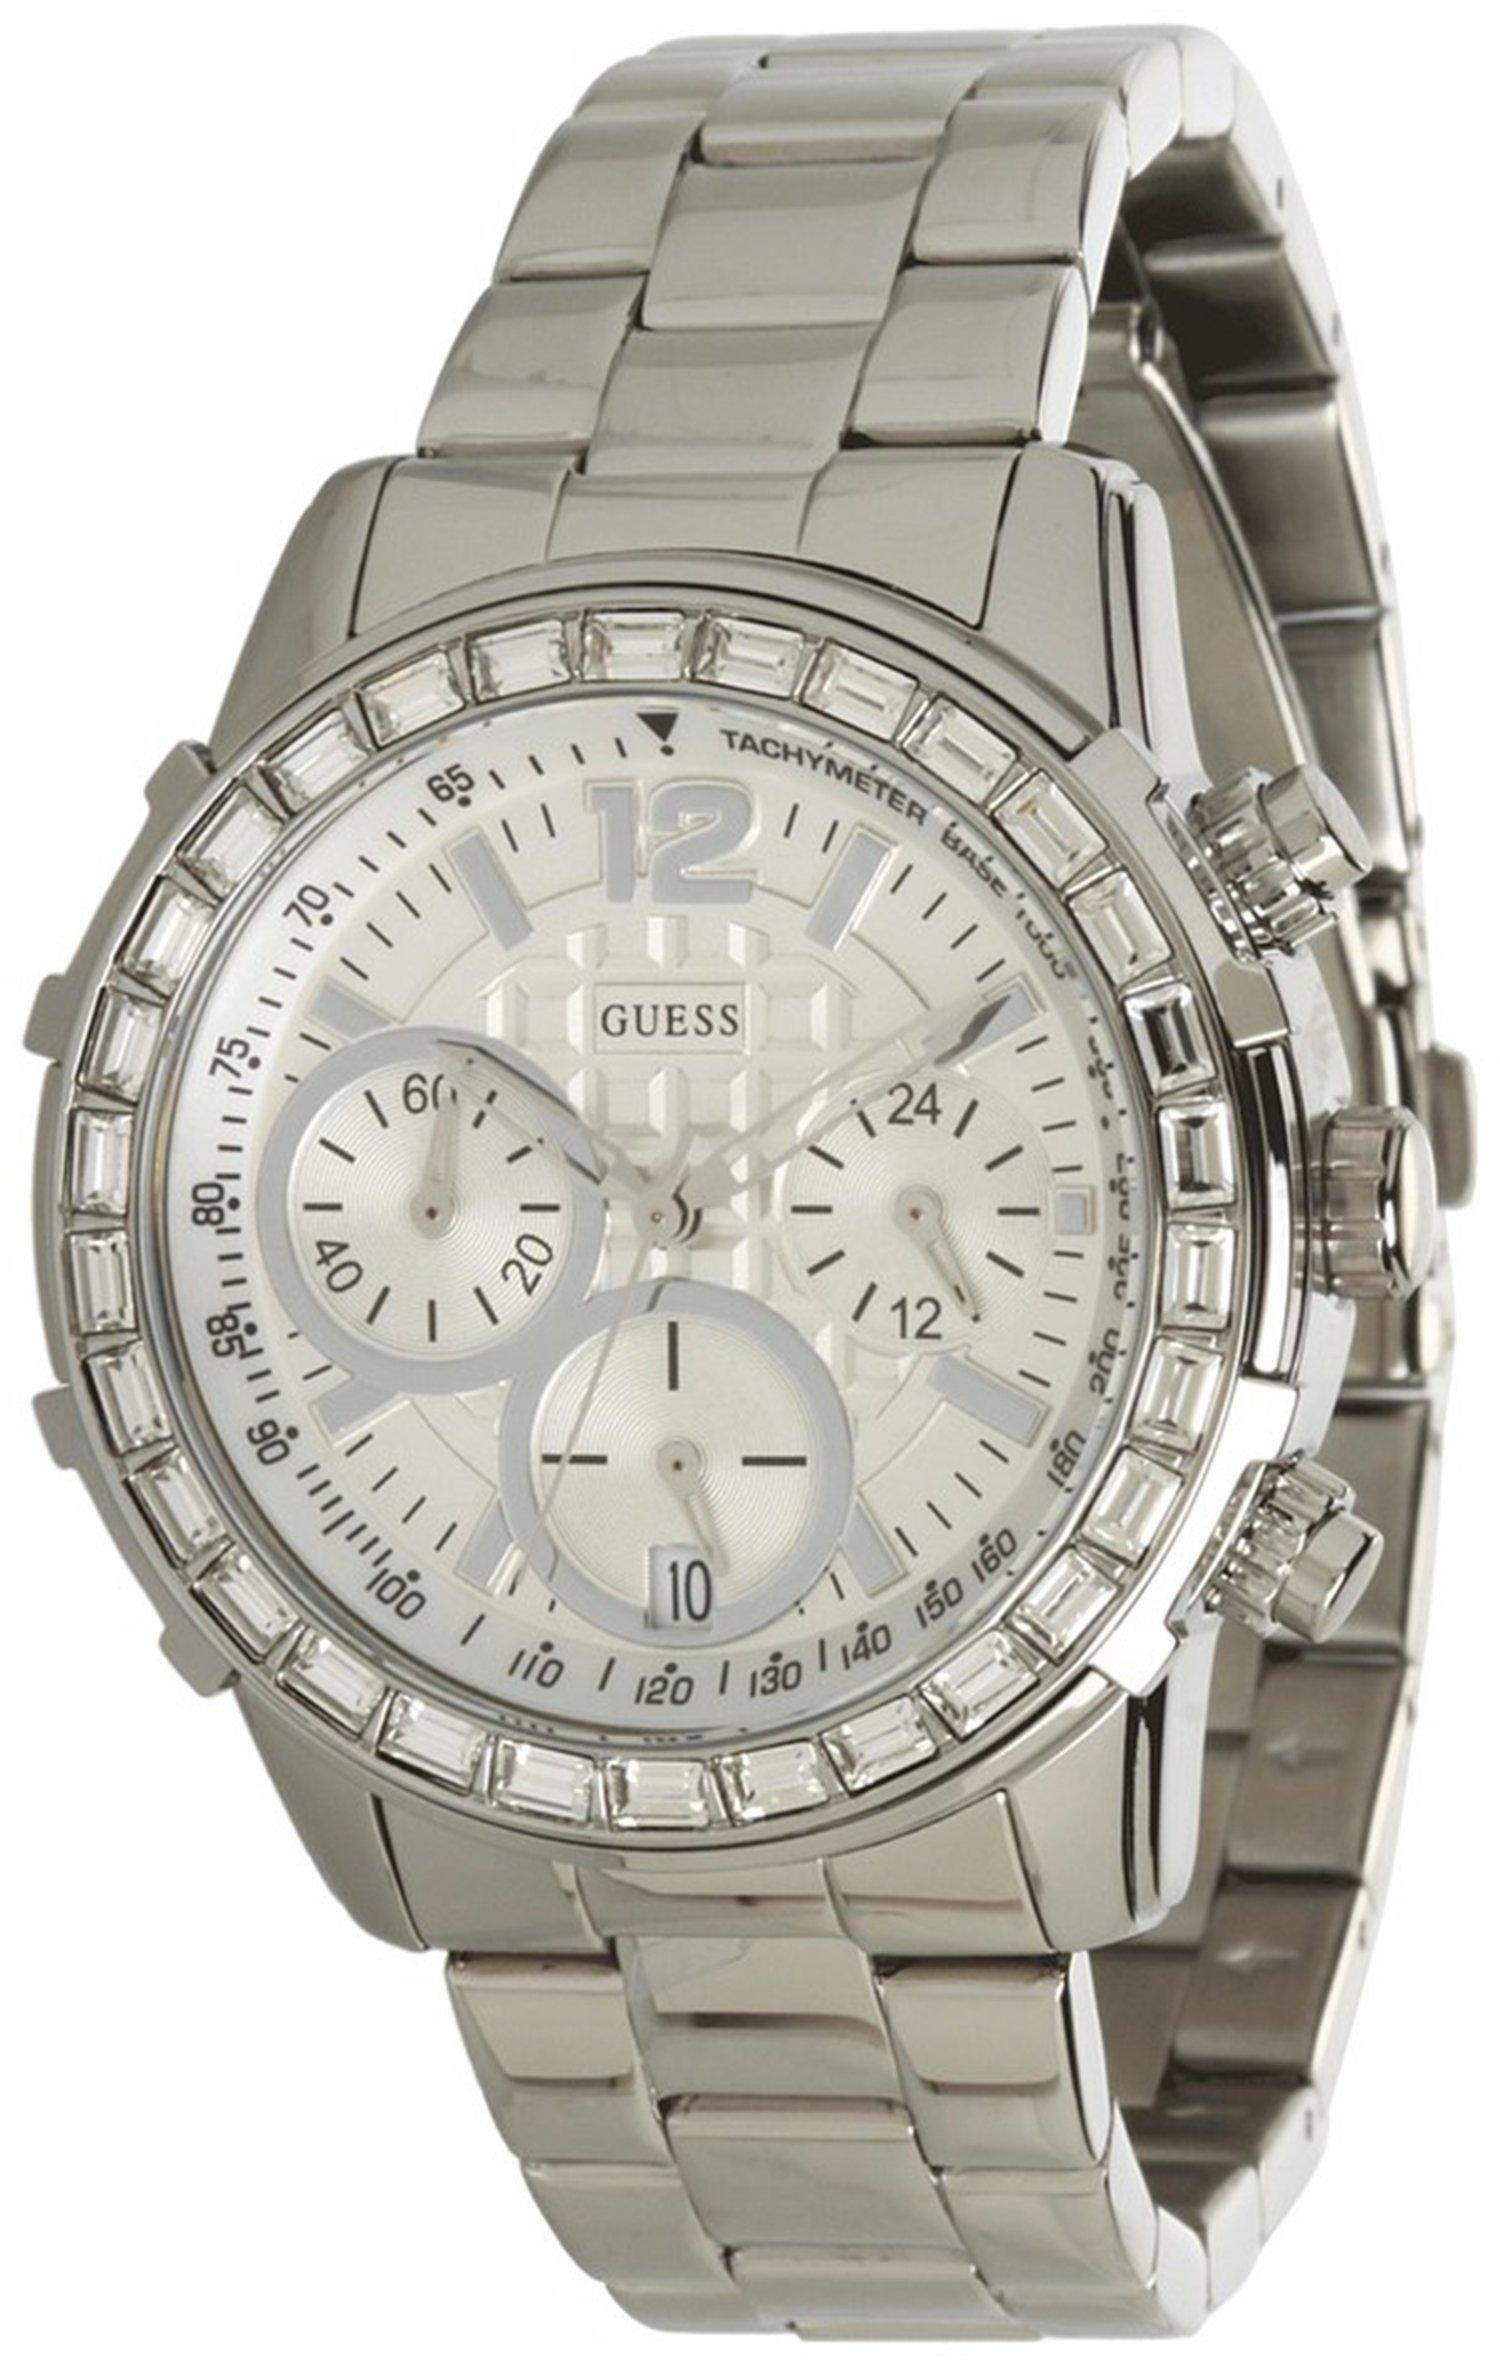 GUESS Women's U0016L1 Dazzling Sport Chronograph Watch